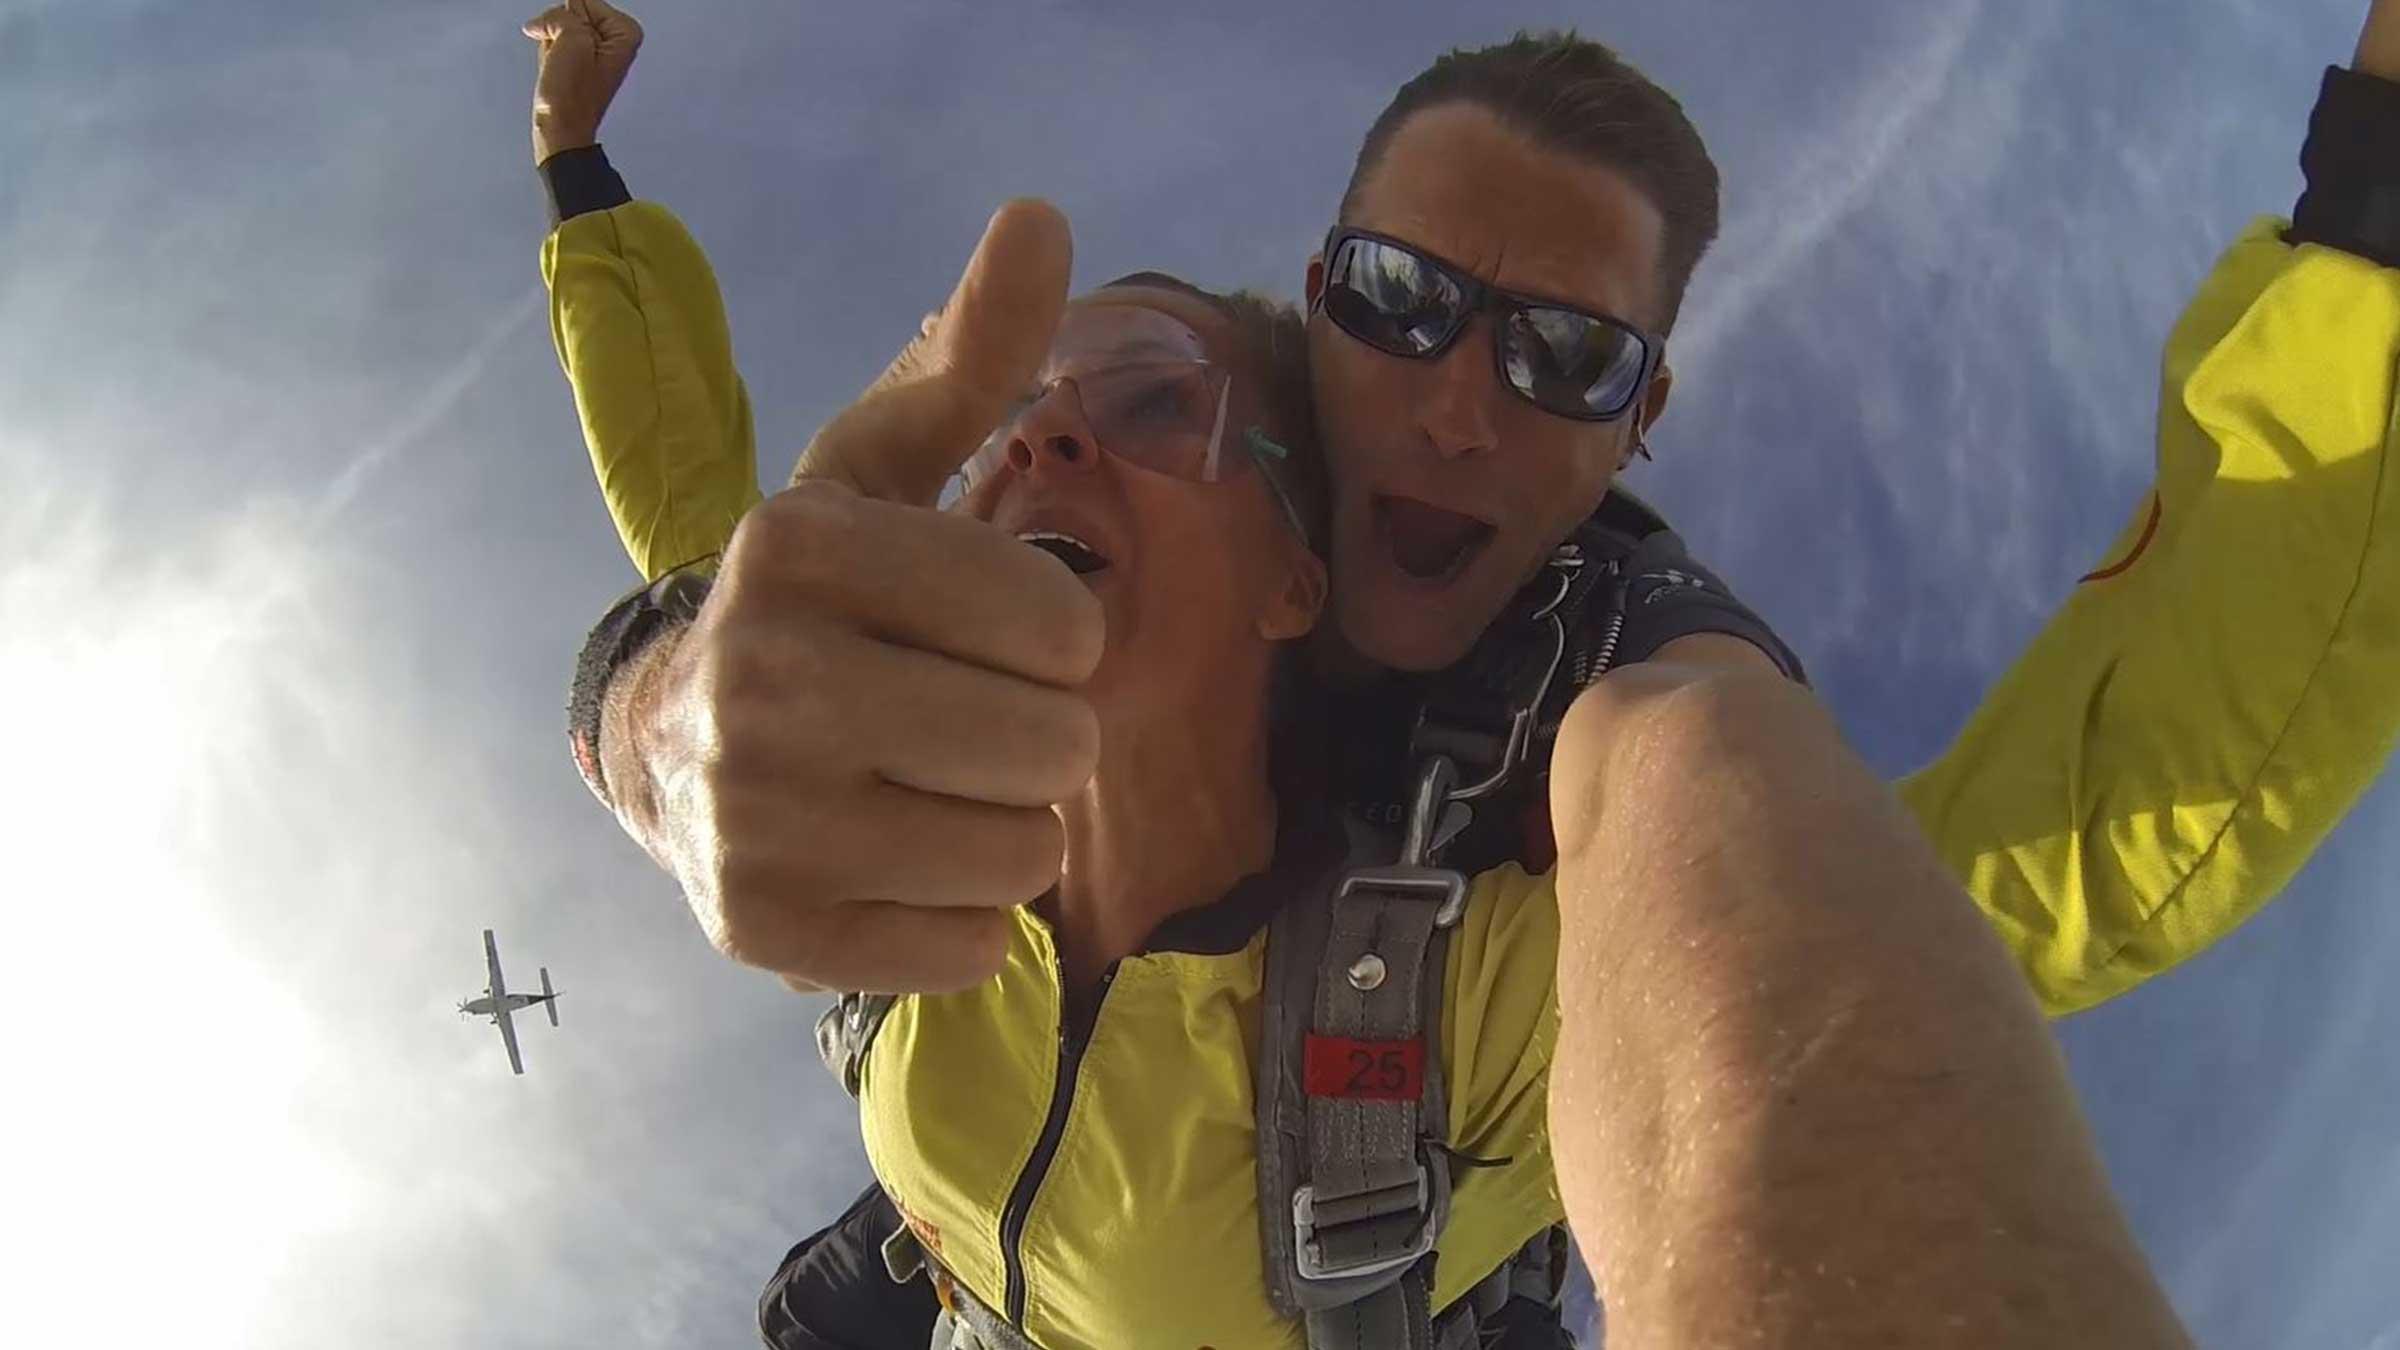 Skydivehomedef